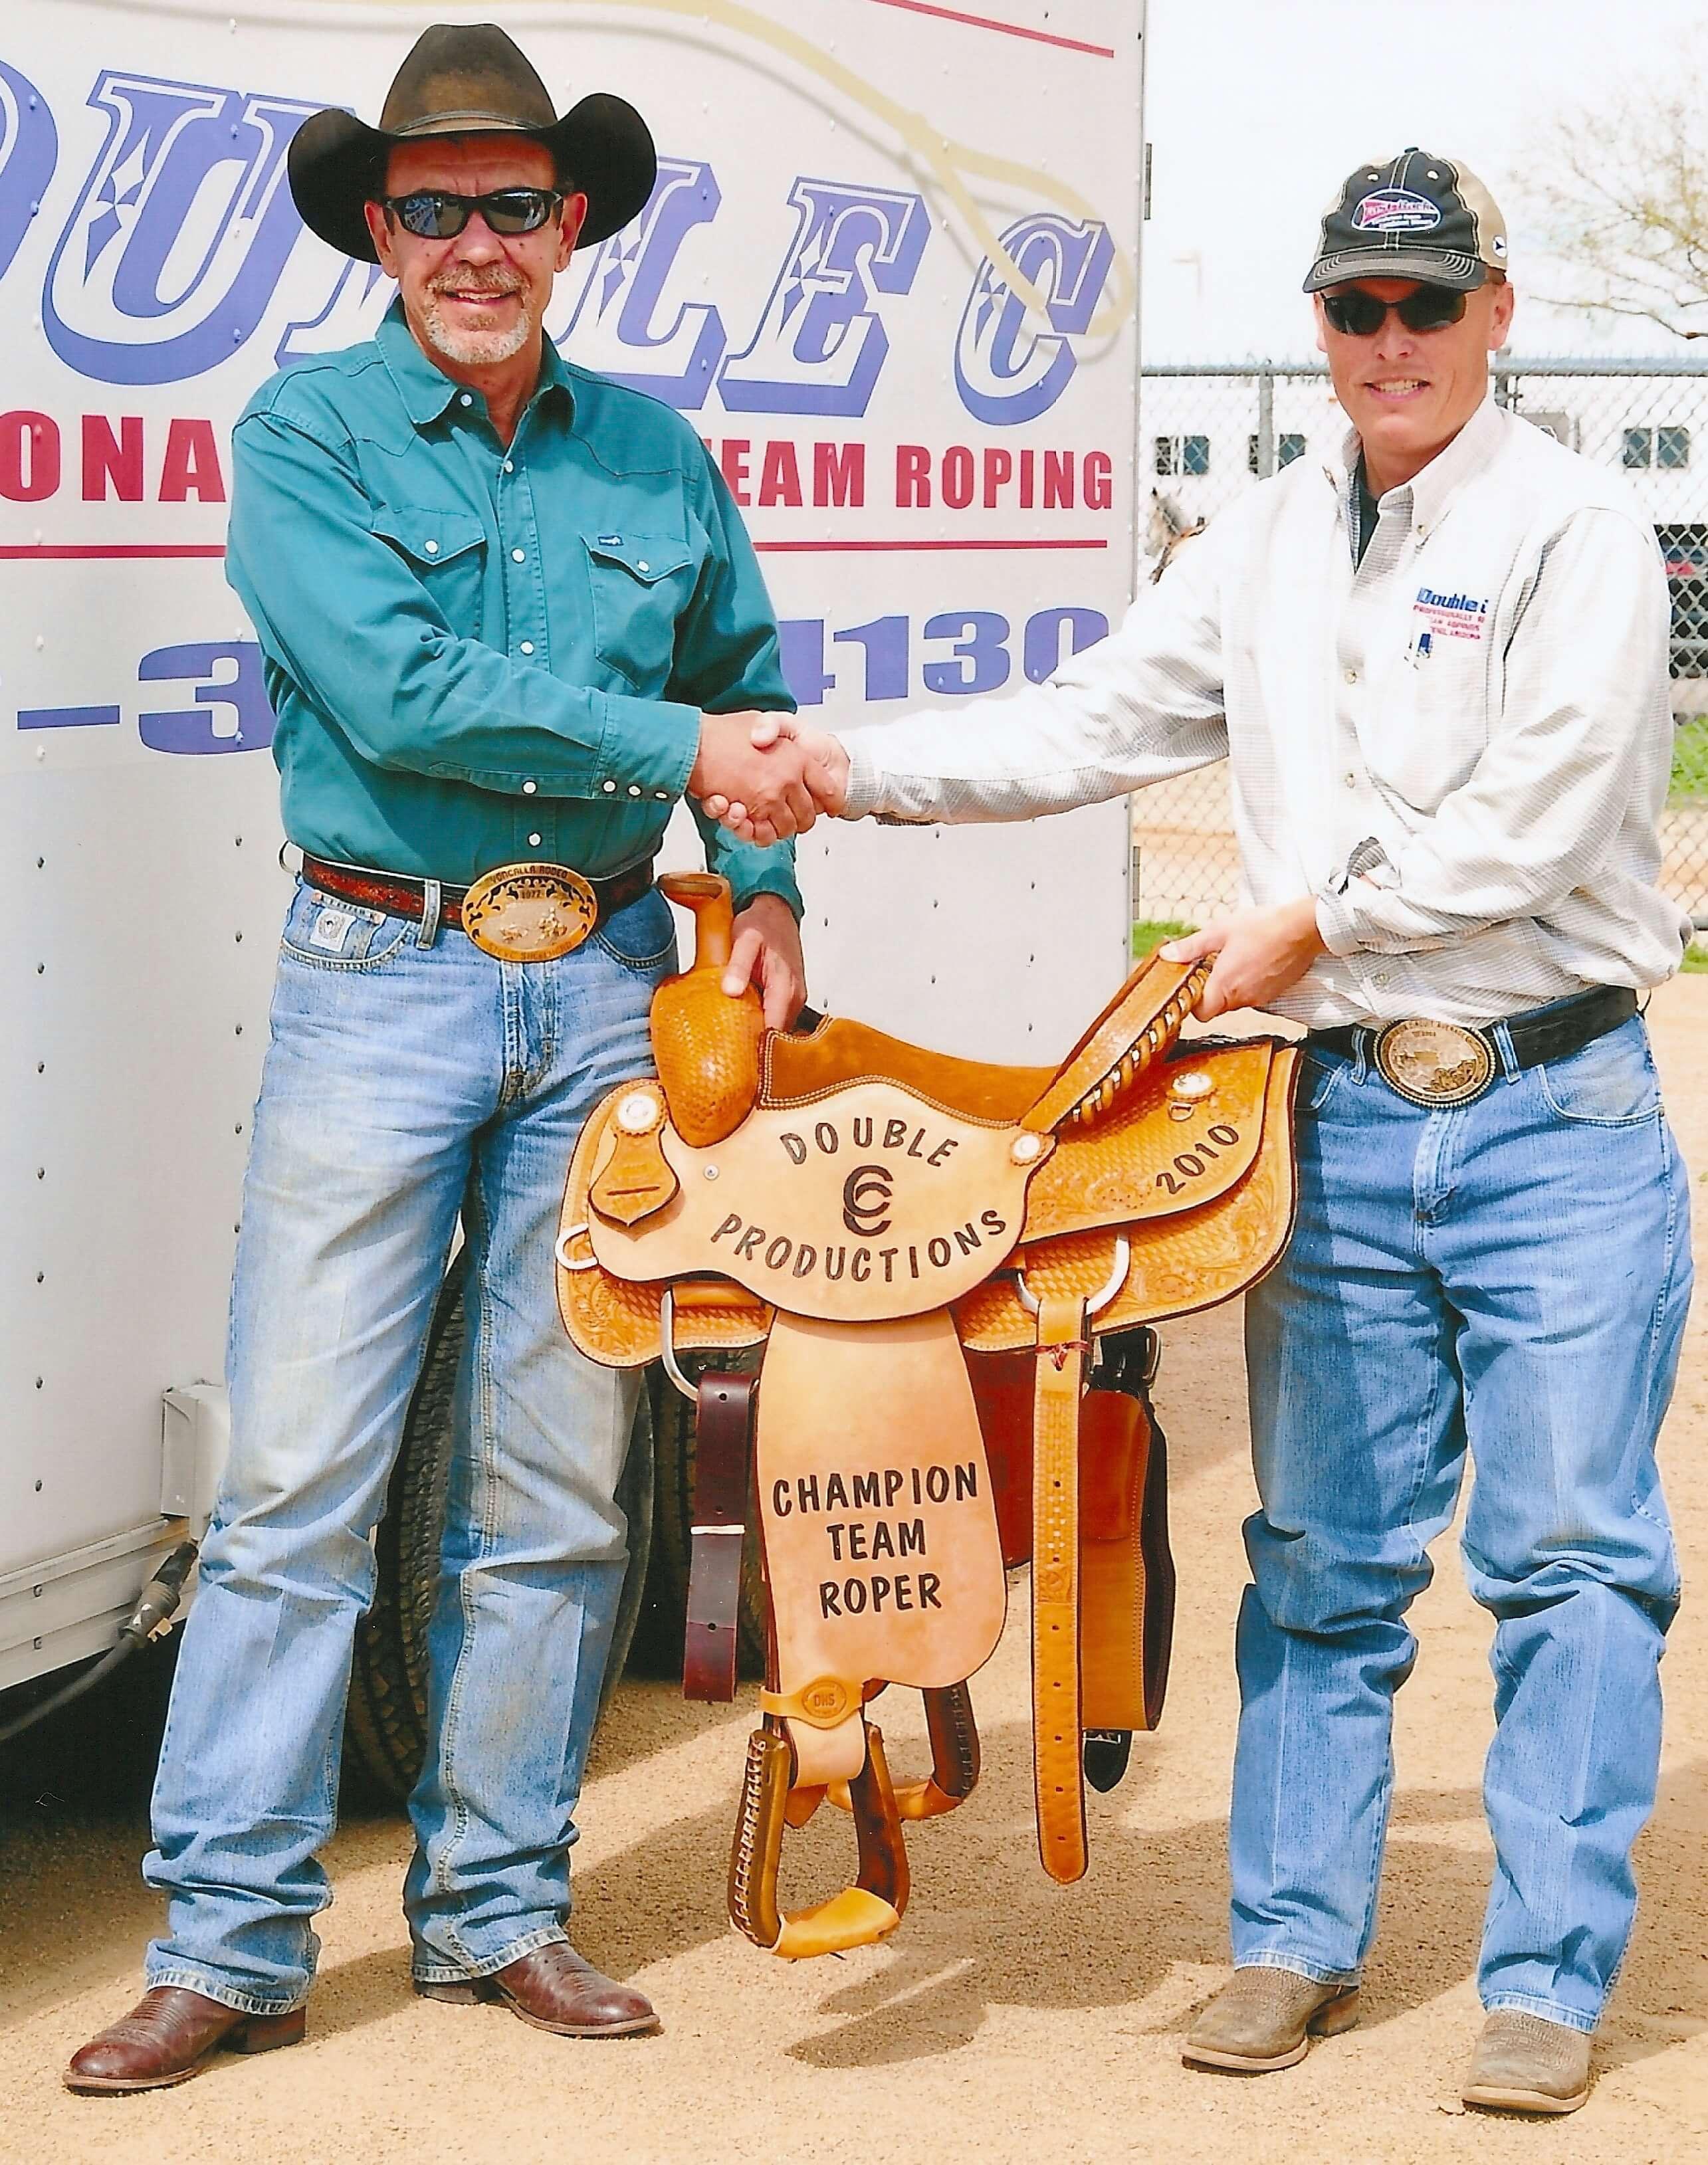 Winning the Saddle